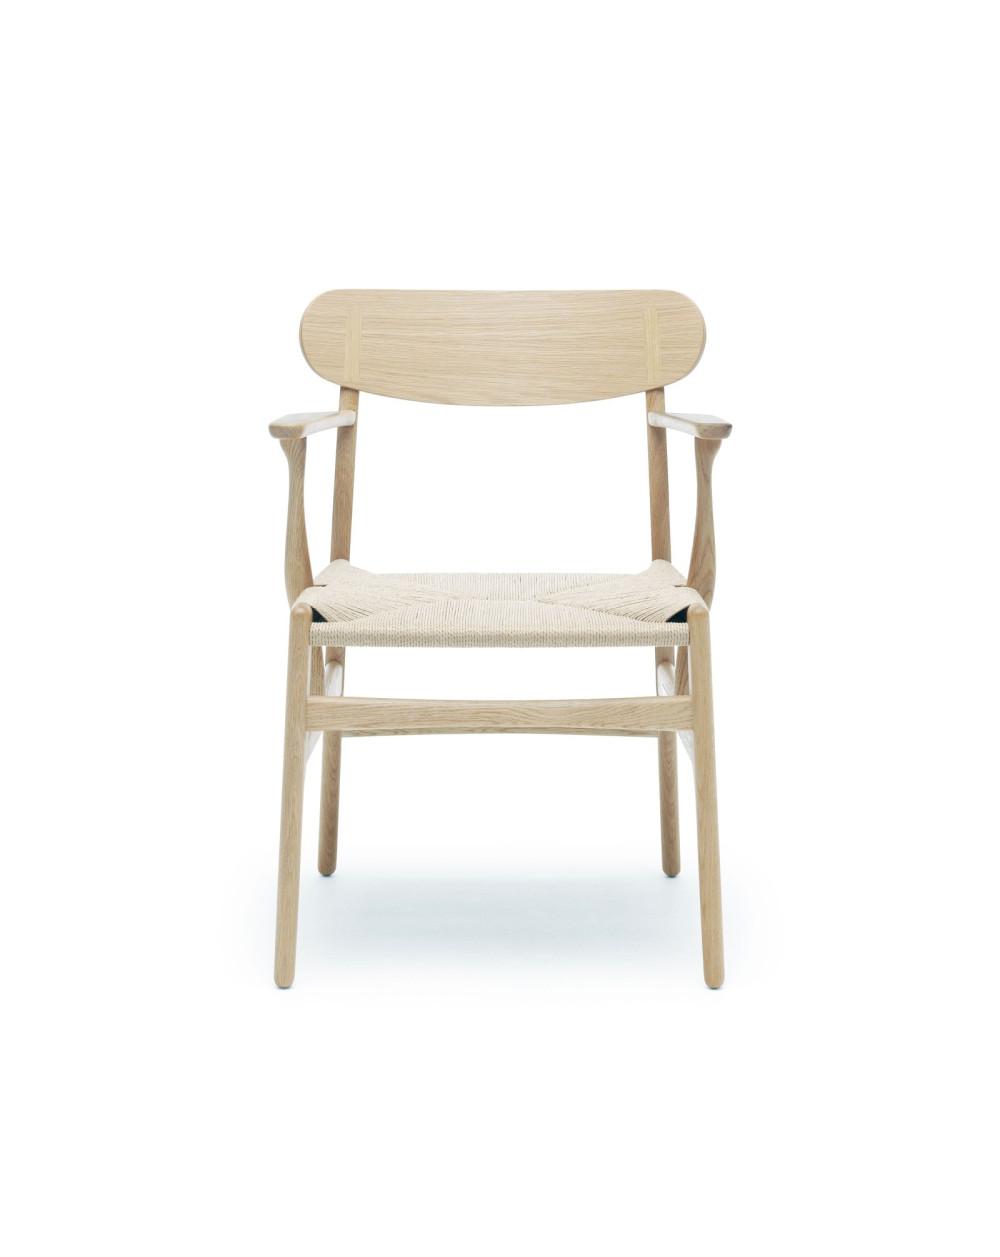 Chaise CH26, Hans J. Wegner